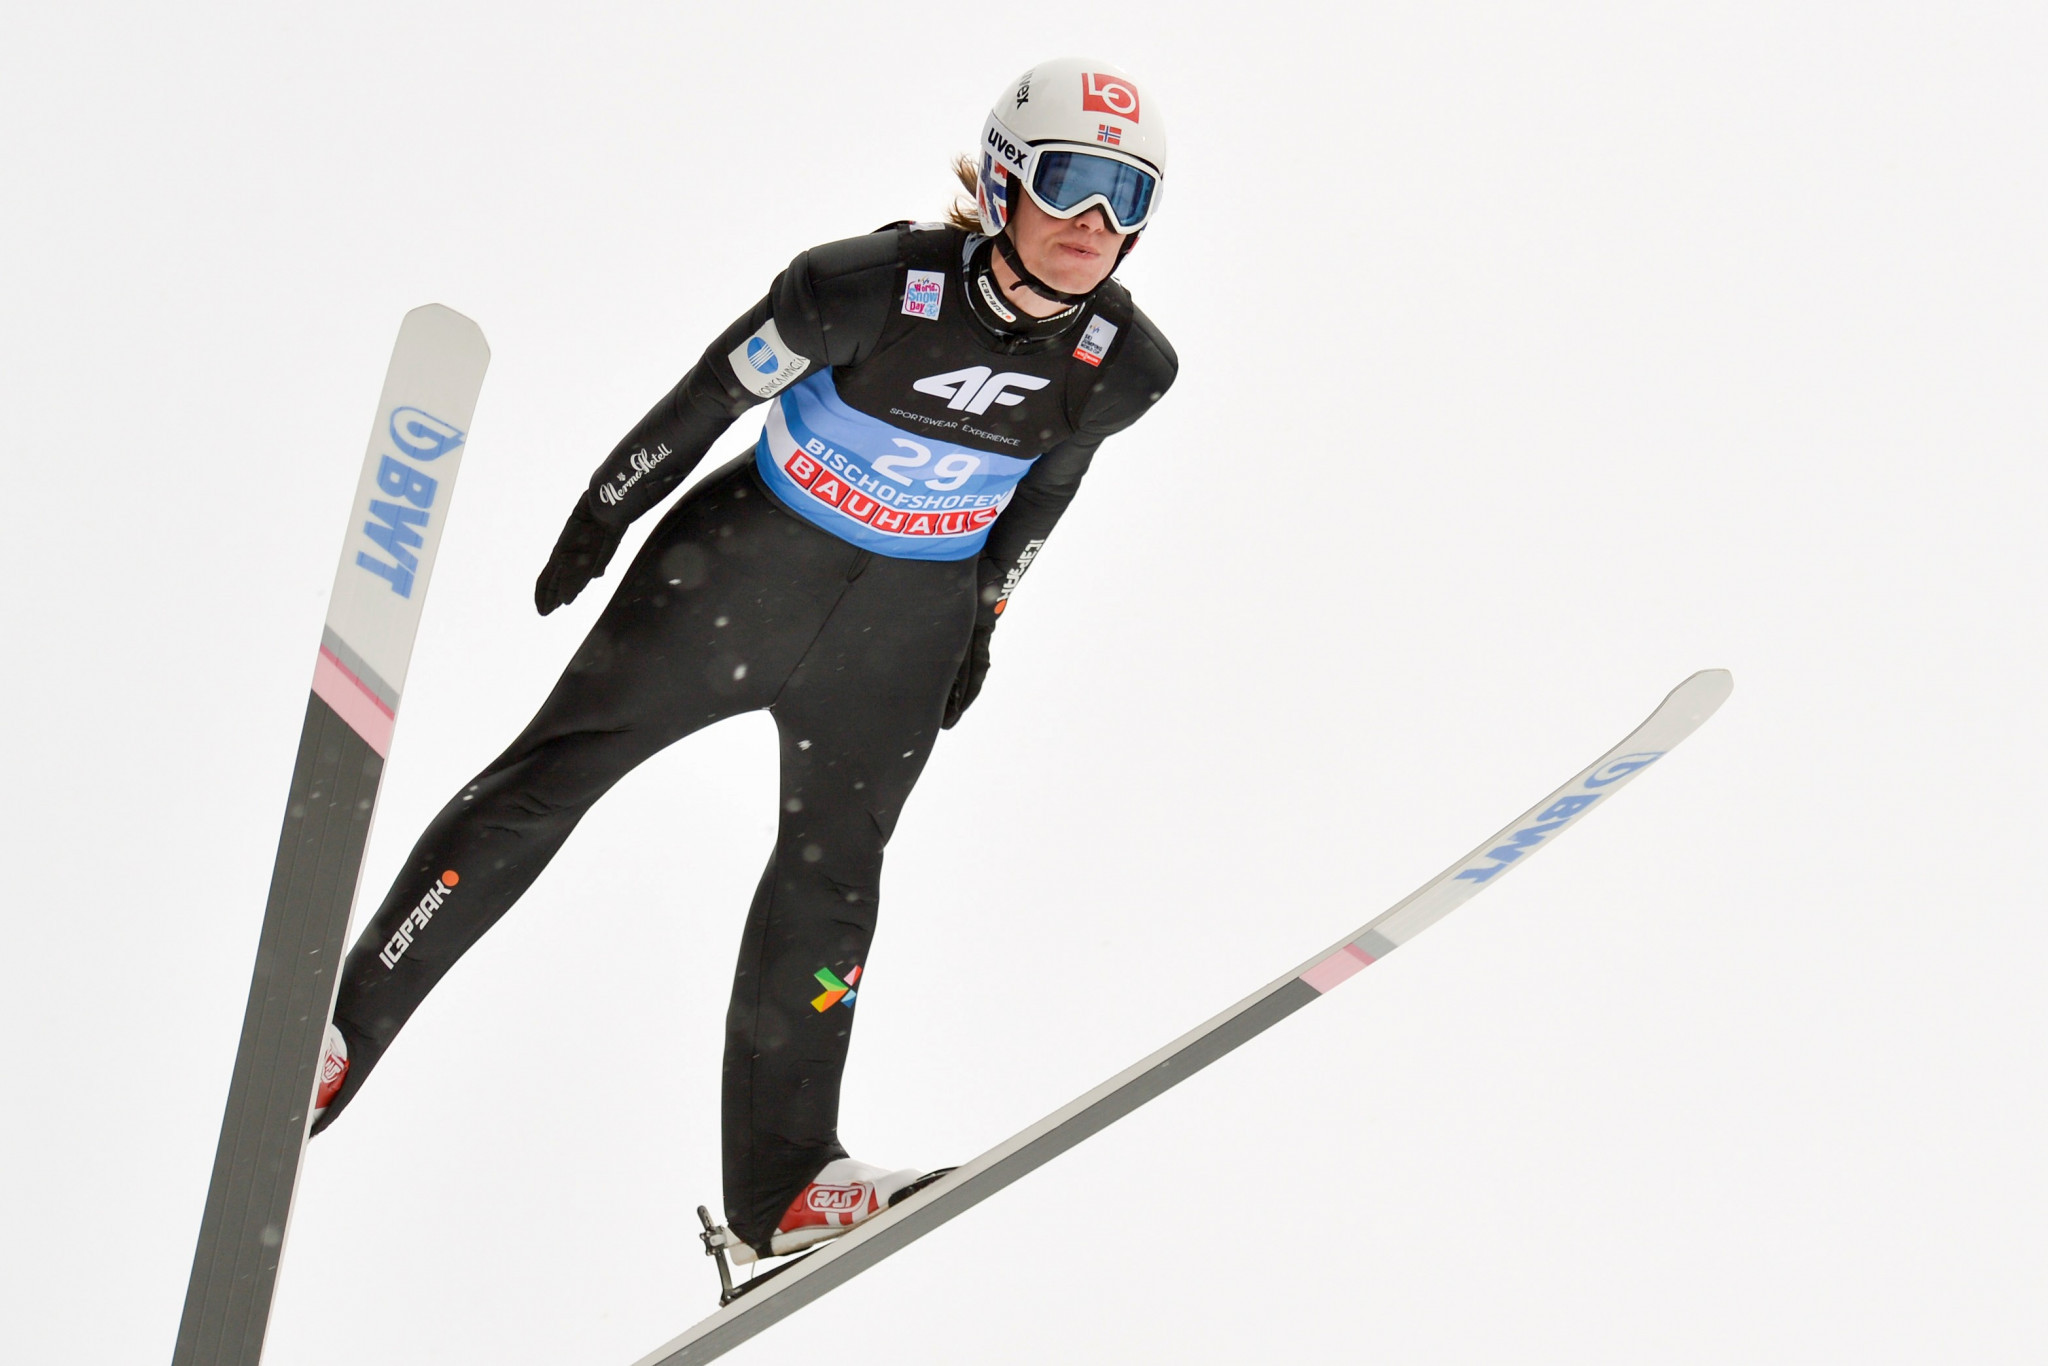 Tande wins FIS Ski Jumping World Cup season-opener